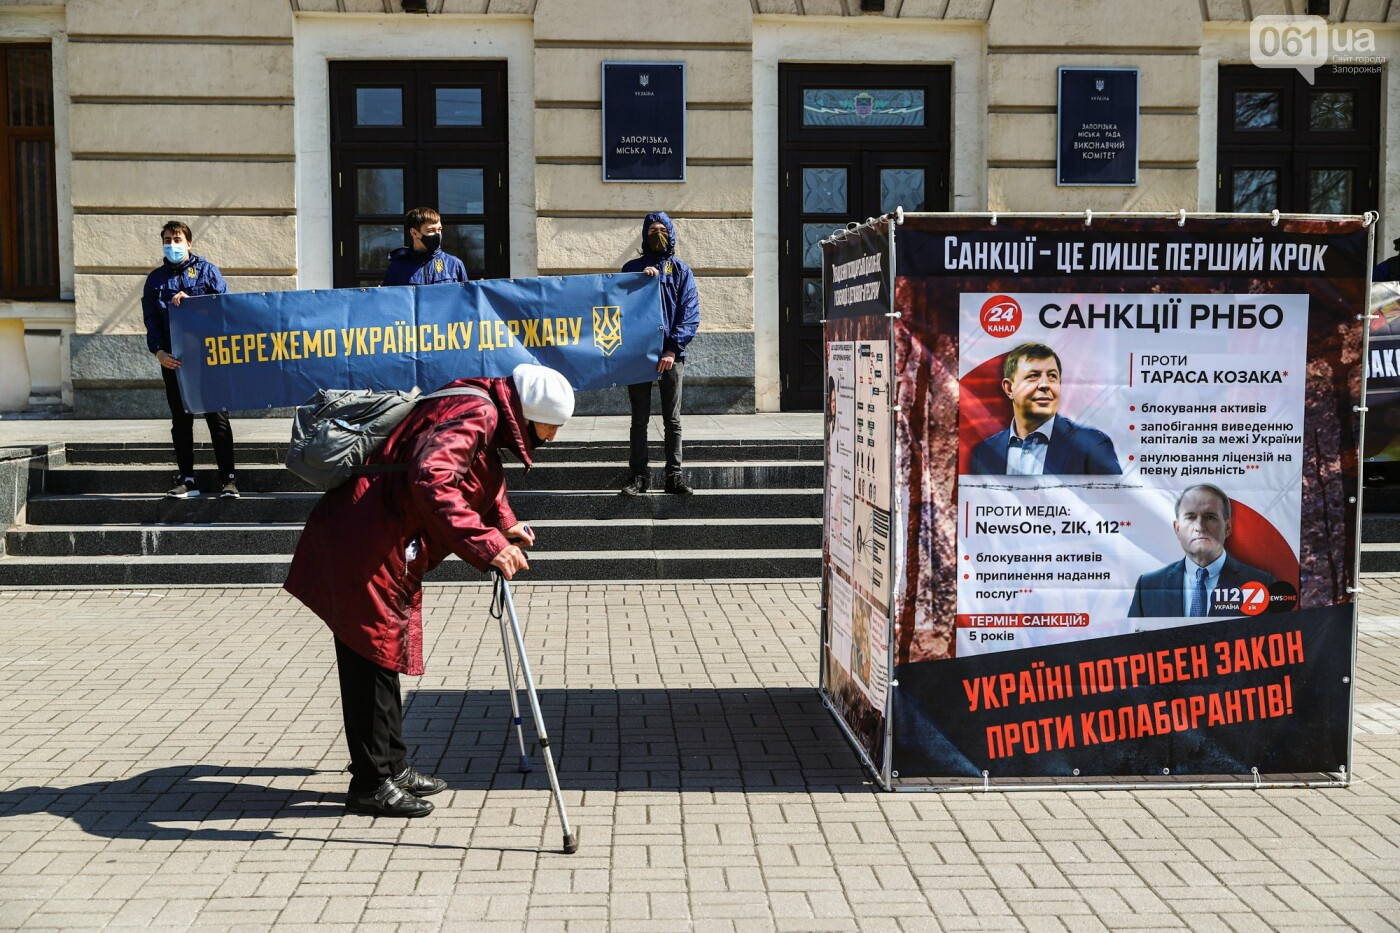 В Запорожье возле мэрии установили стенды с портретами Медведчука и Шария, - ФОТО, фото-15